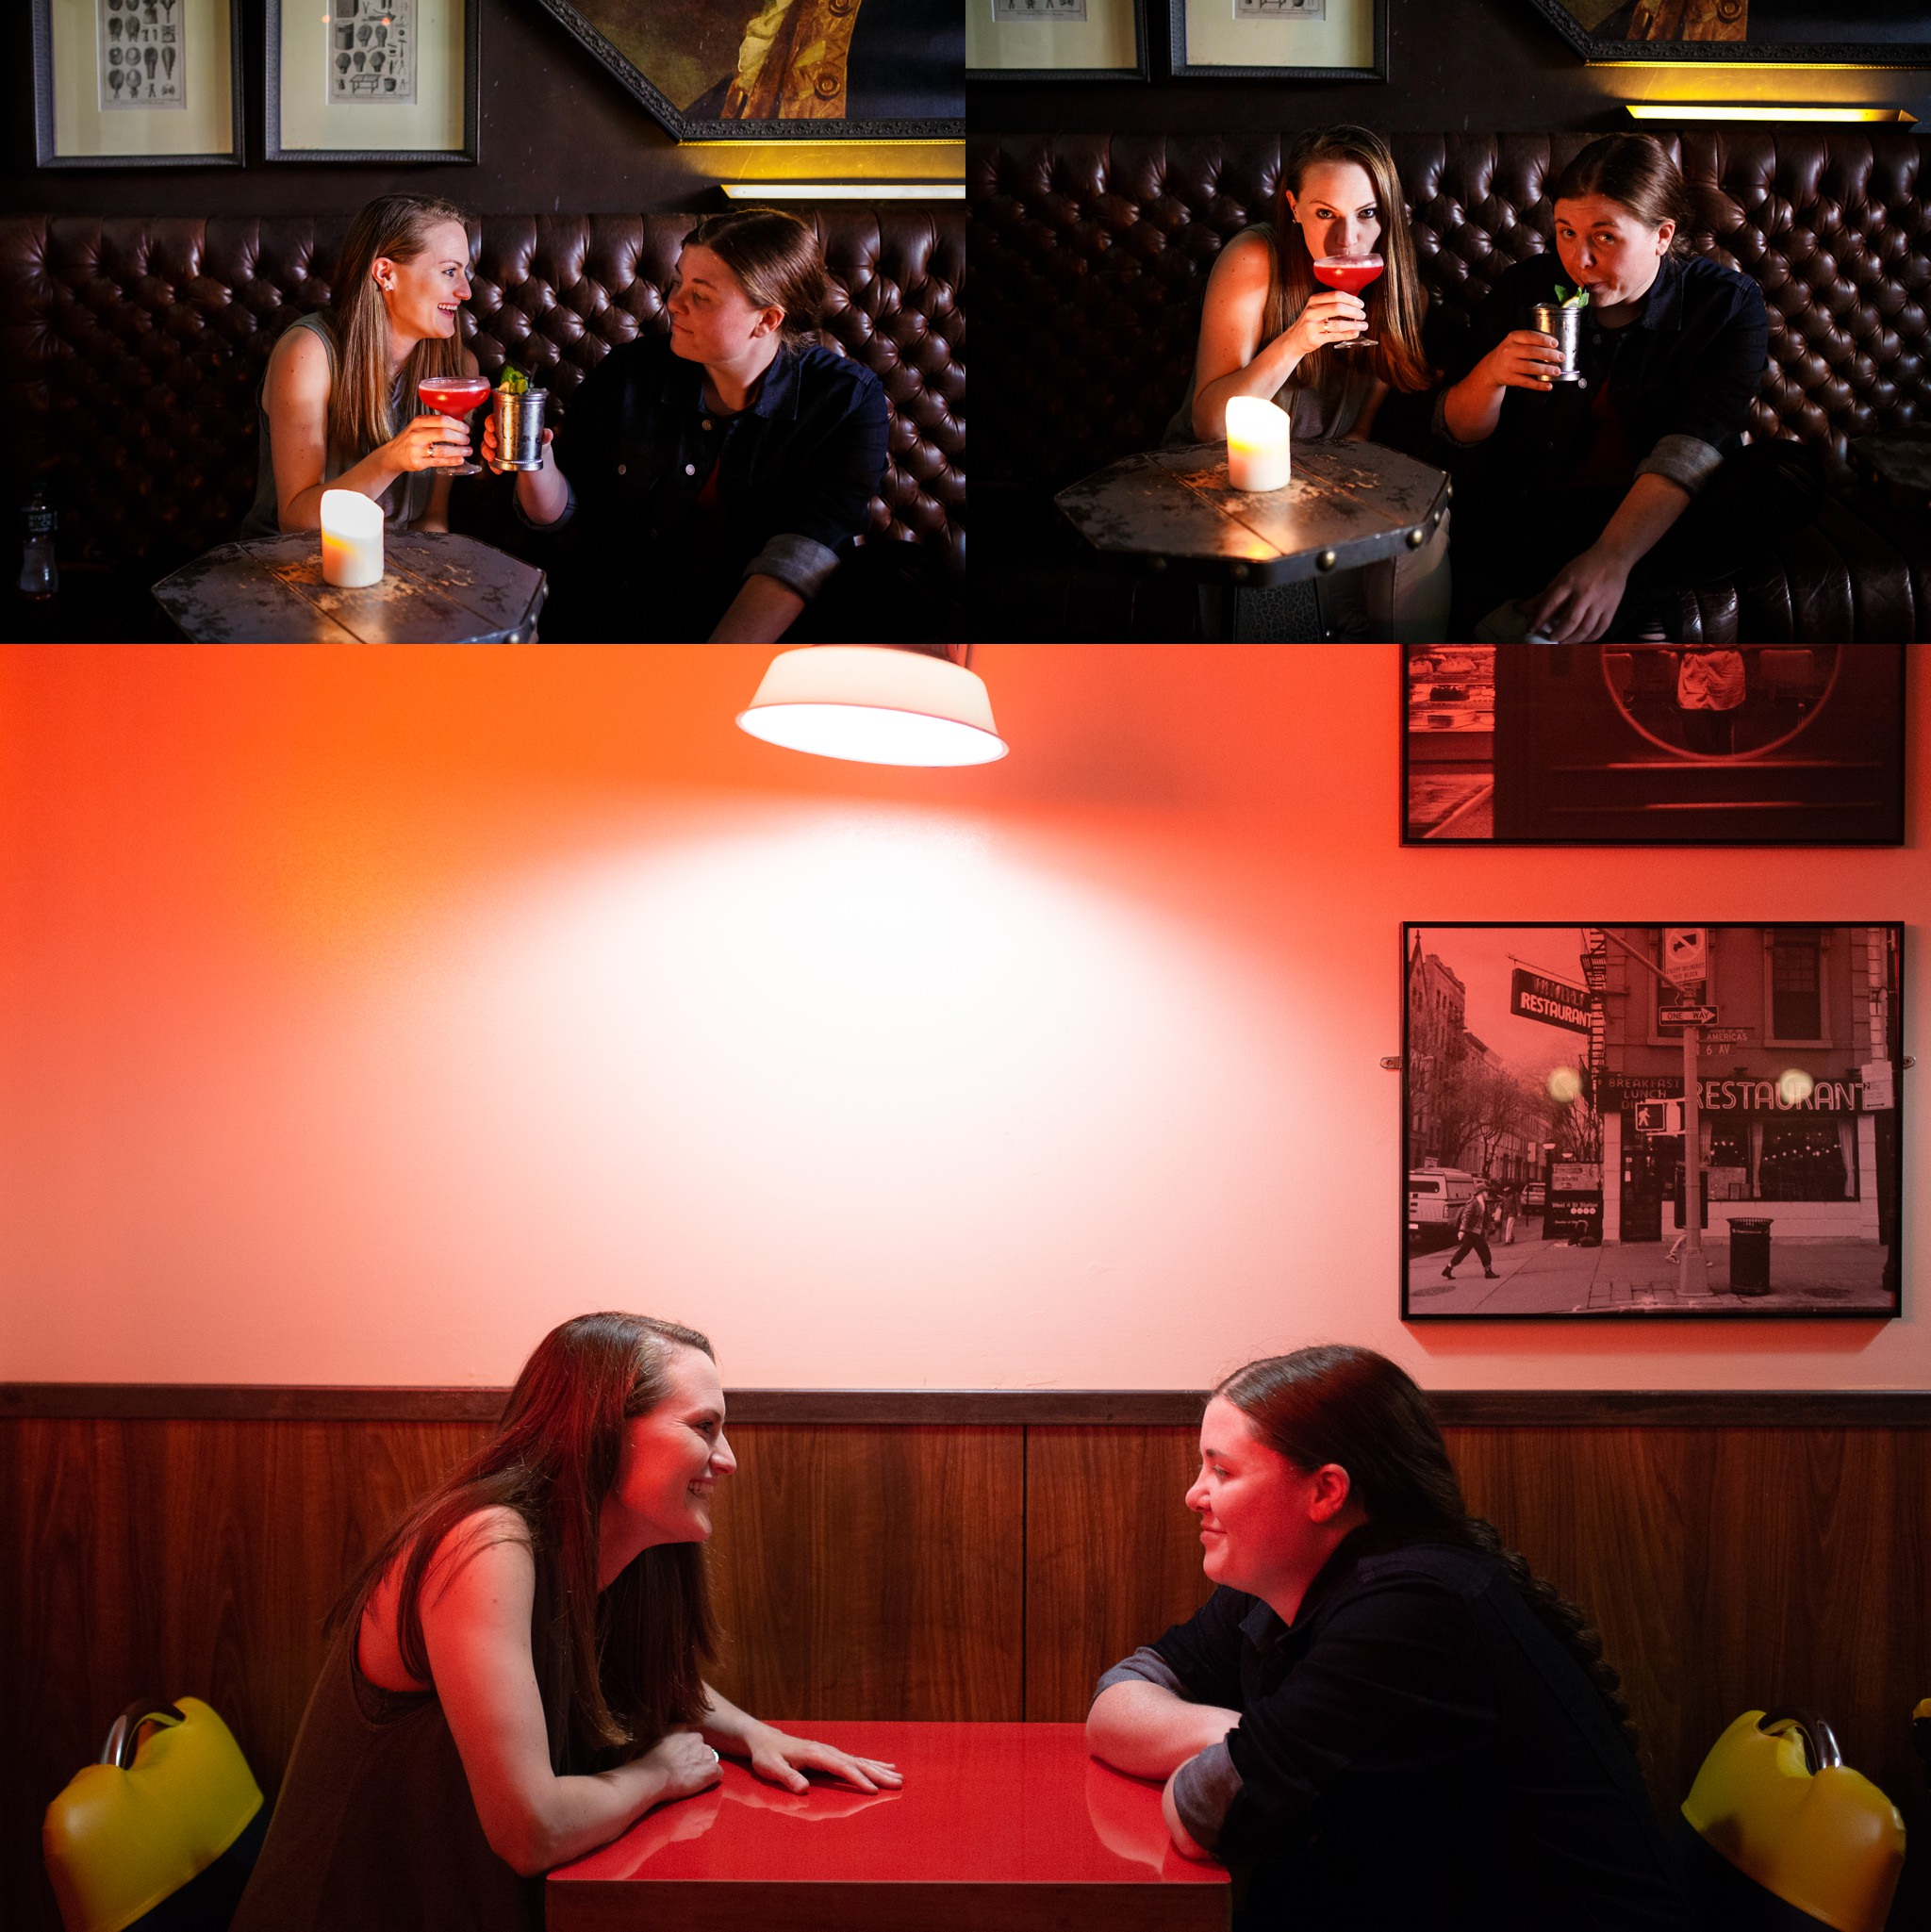 Elisha-Clarke-Photography-Dublin-City-Wedding_0025.jpg